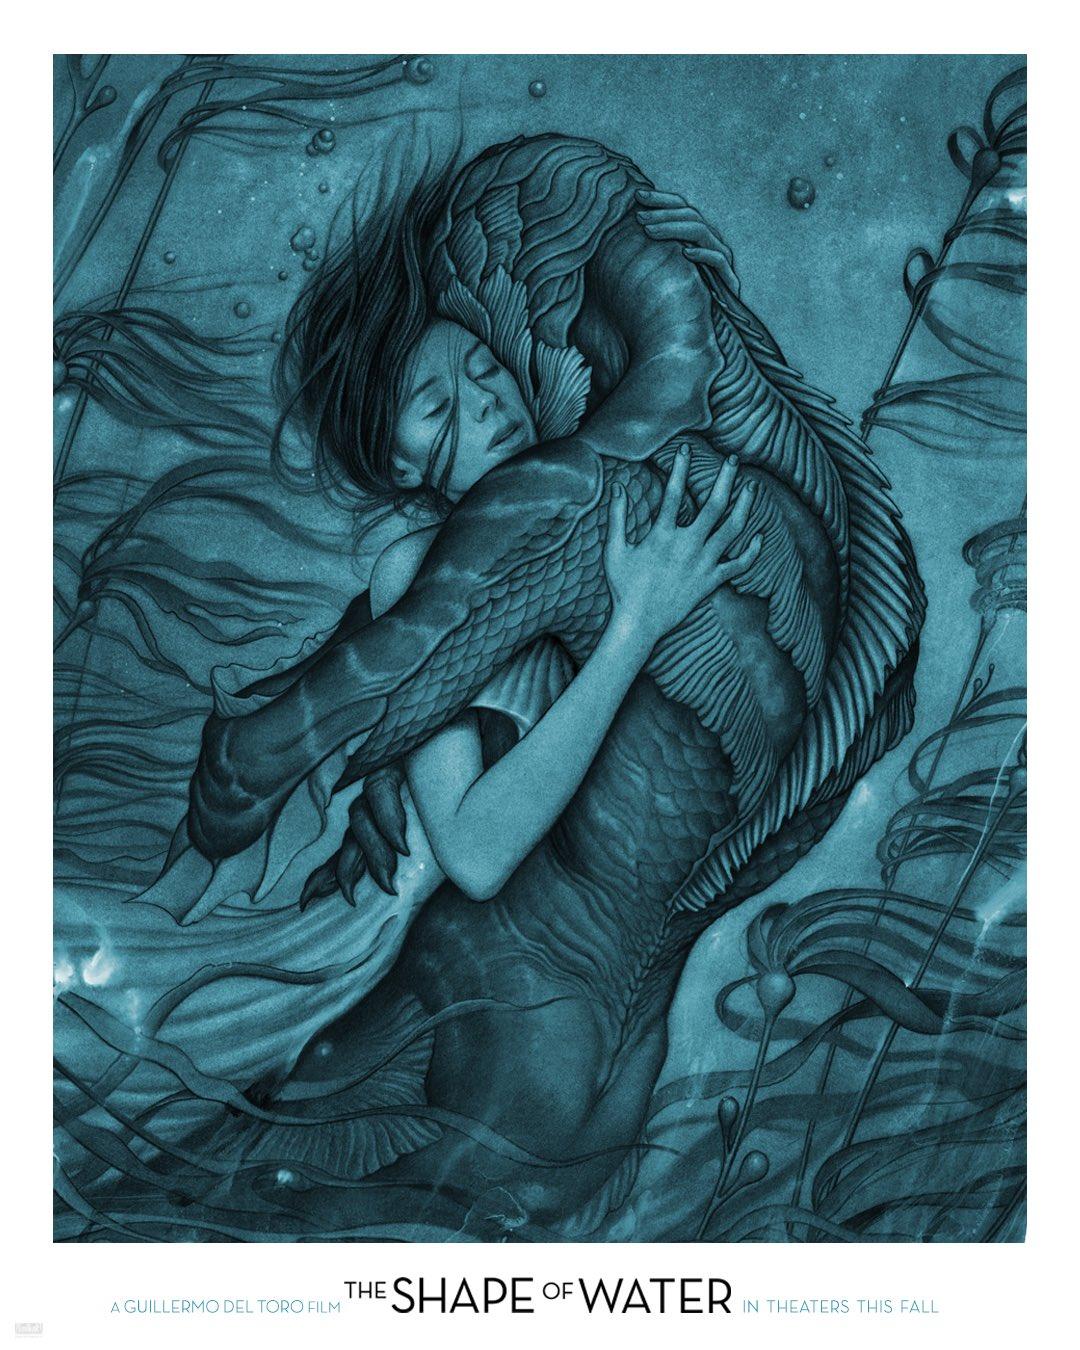 the-shape-of-water-guillermo-del-torro-film-art-illustration-poster-james-jean.jpg